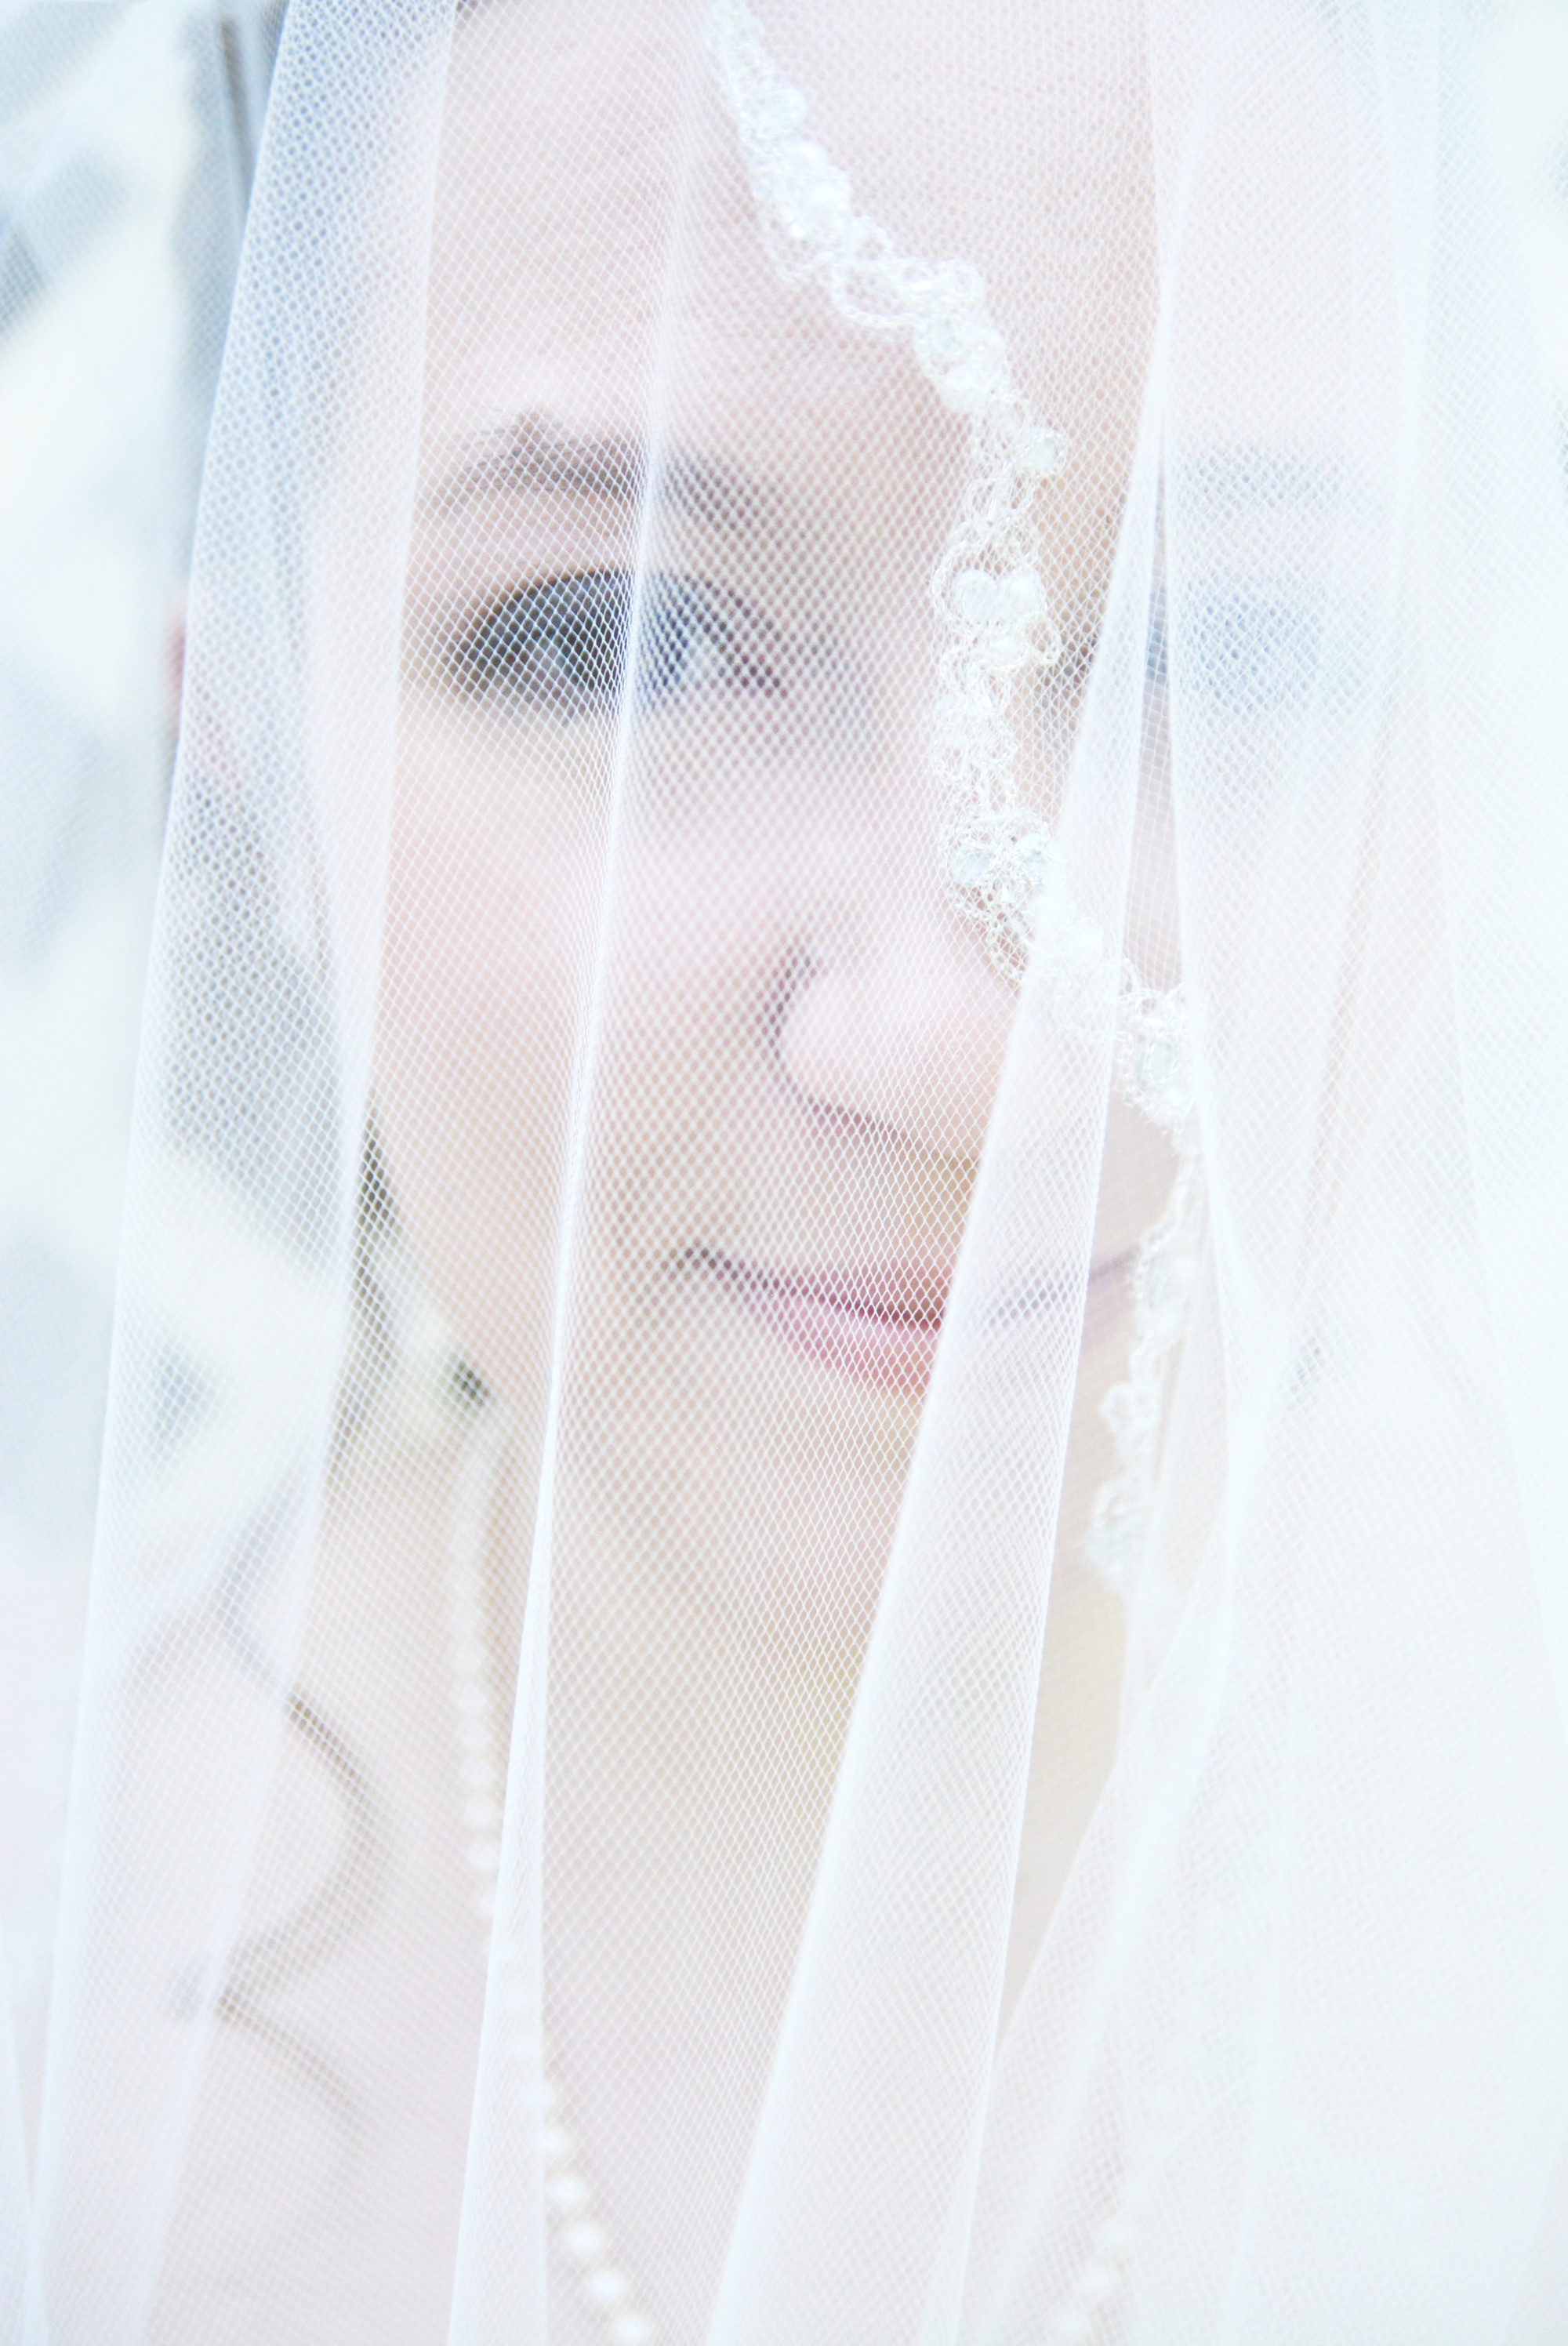 The Brady Inn Wedding Photography - Six Hearts Photography007